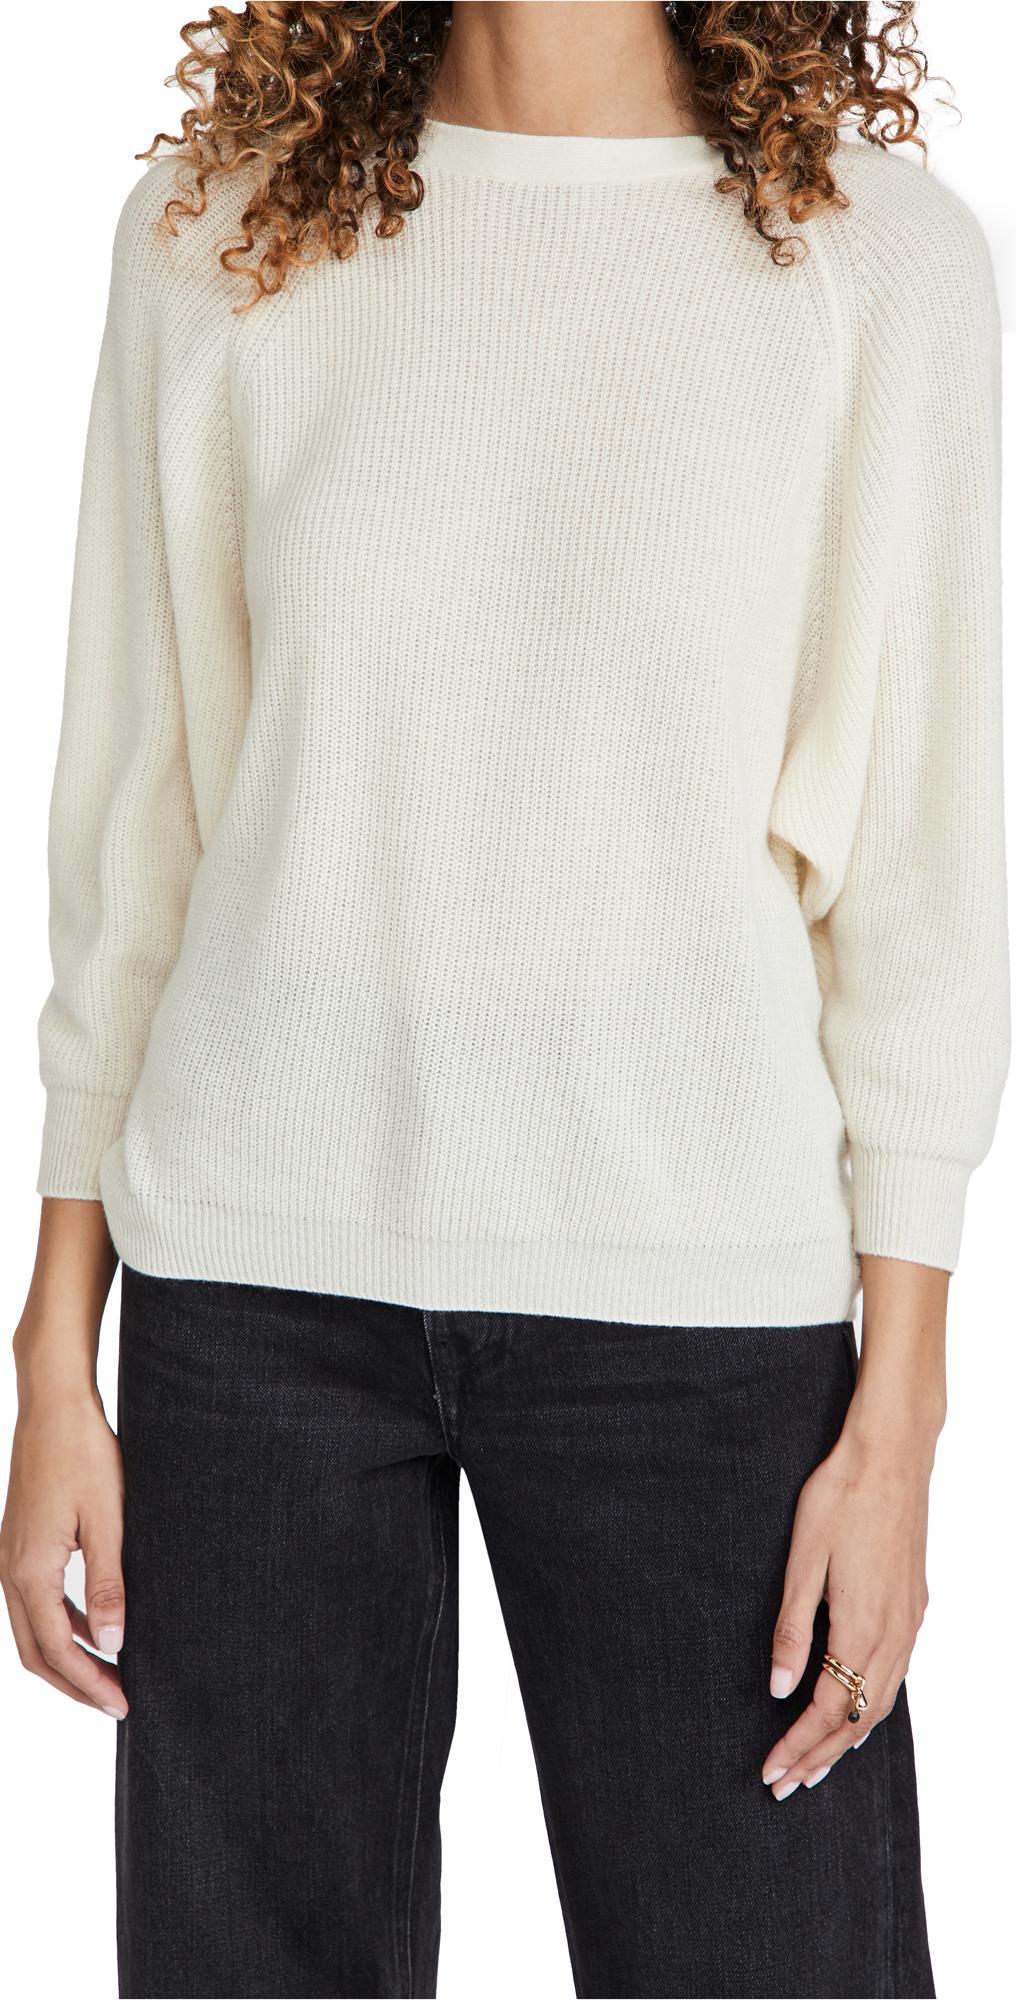 Ba & sh Cram Cashmere Sweater